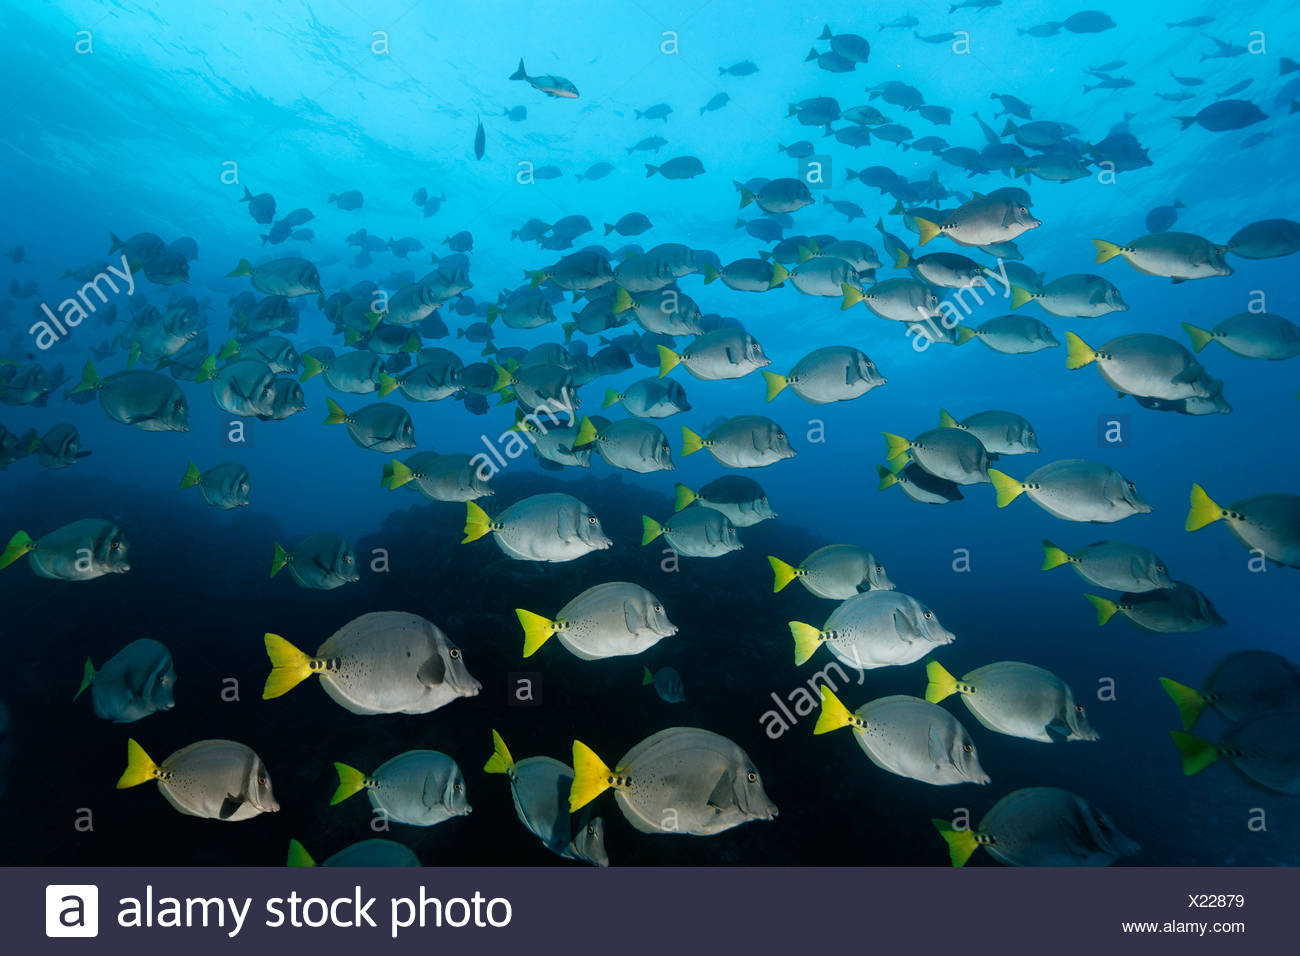 Razor surgeonfish (Prionurus laticlavius), San Benedicto Island, near Socorro, Revillagigedo Islands, archipelago, Mexico - Stock Image